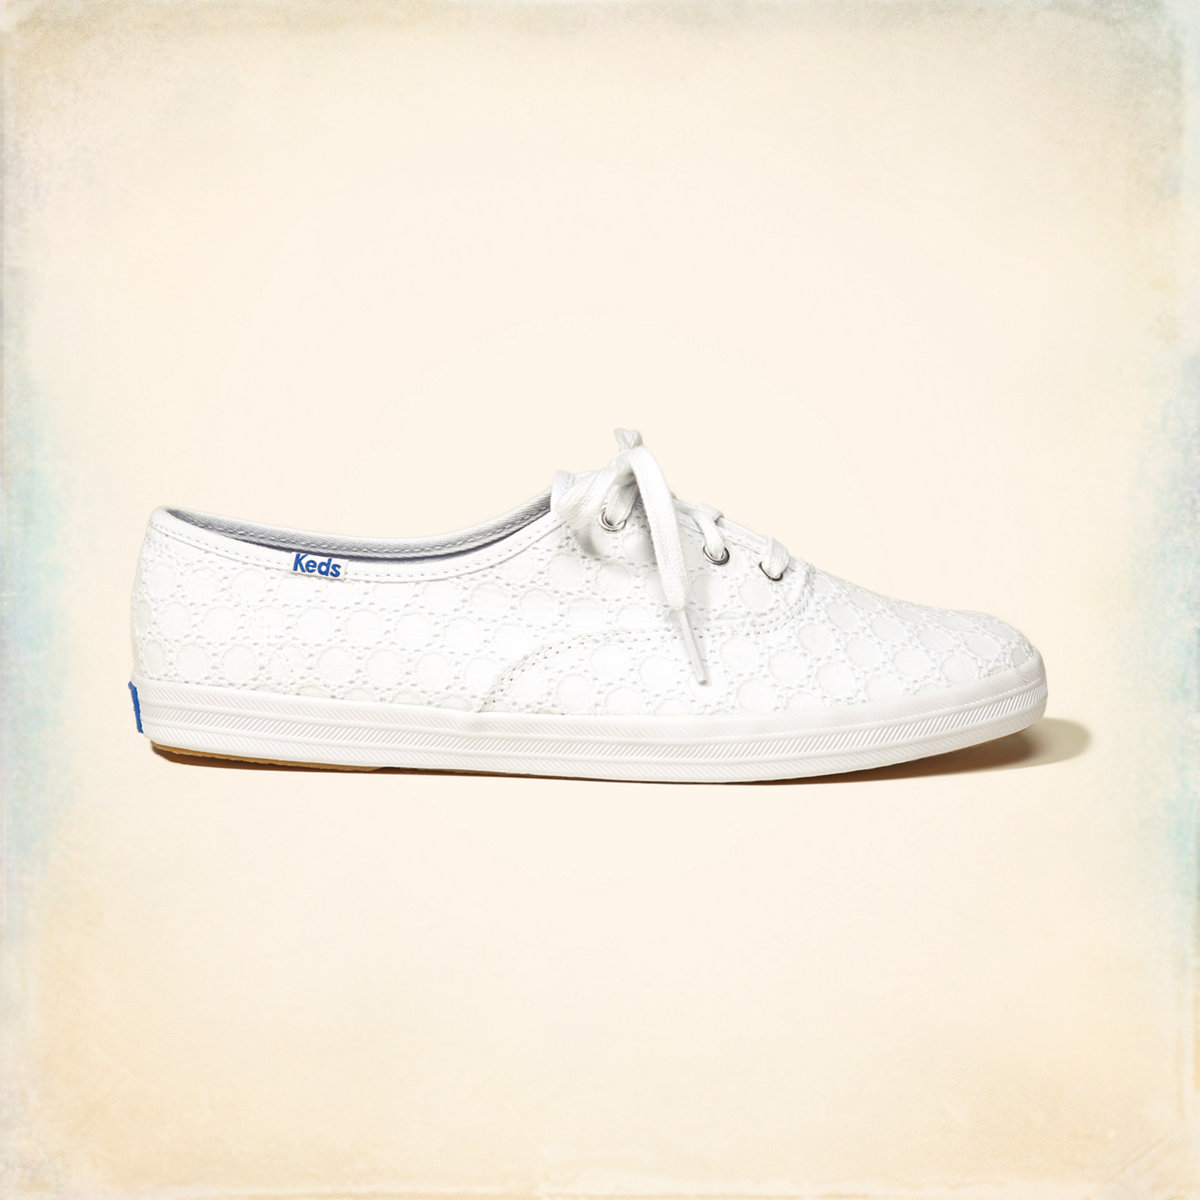 Keds Champion Eyelet Sneaker